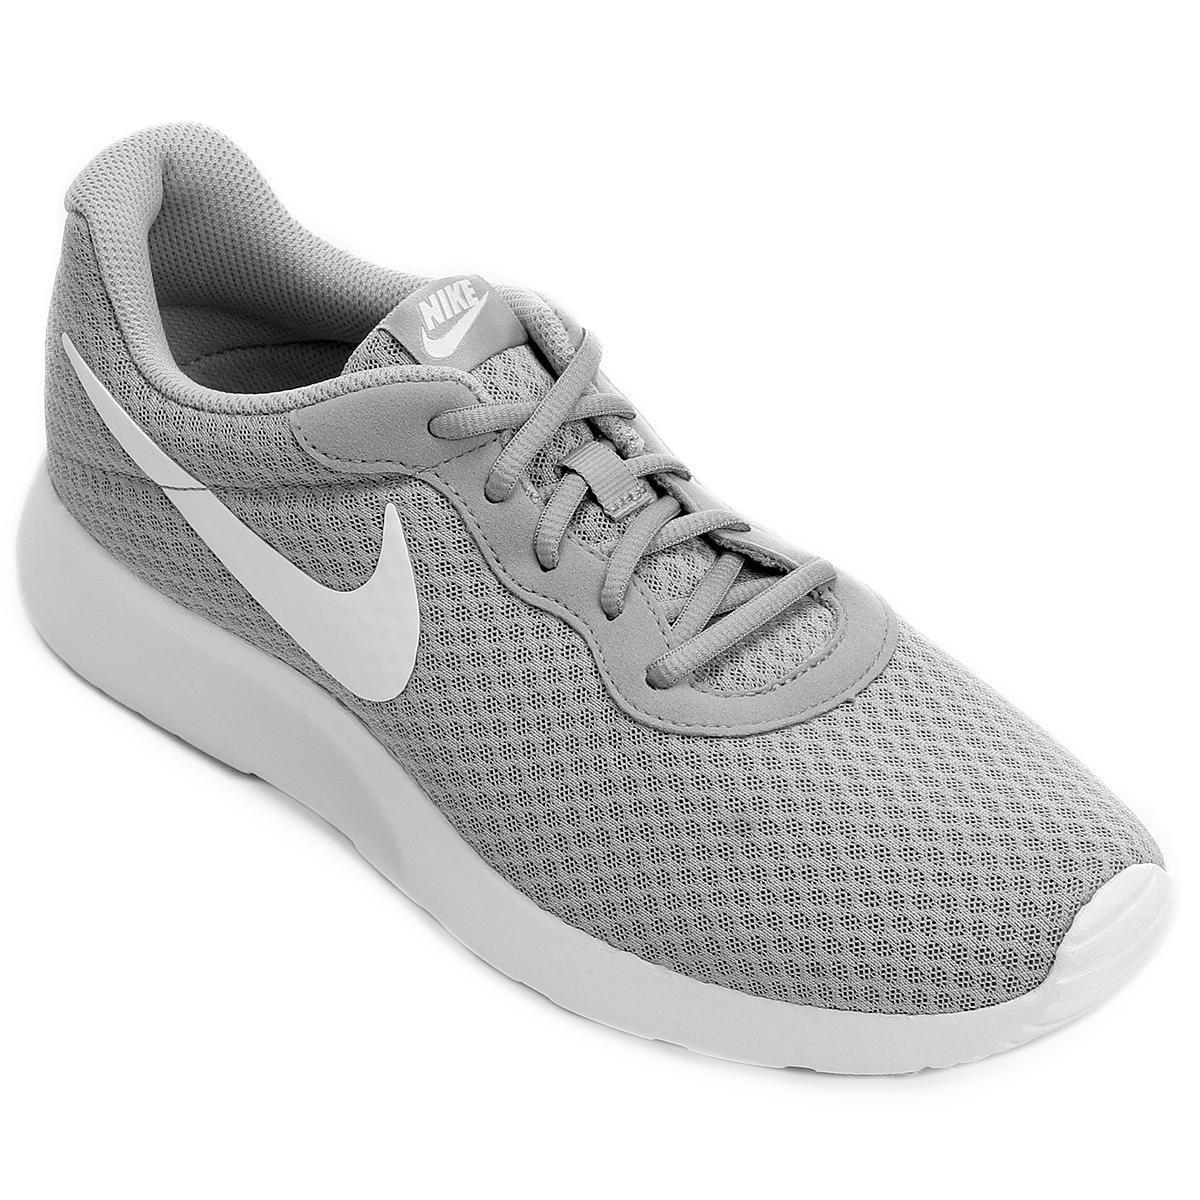 b8cb4d444 Tênis Nike Tanjun Masculino - Cinza e Branco - Compre Agora